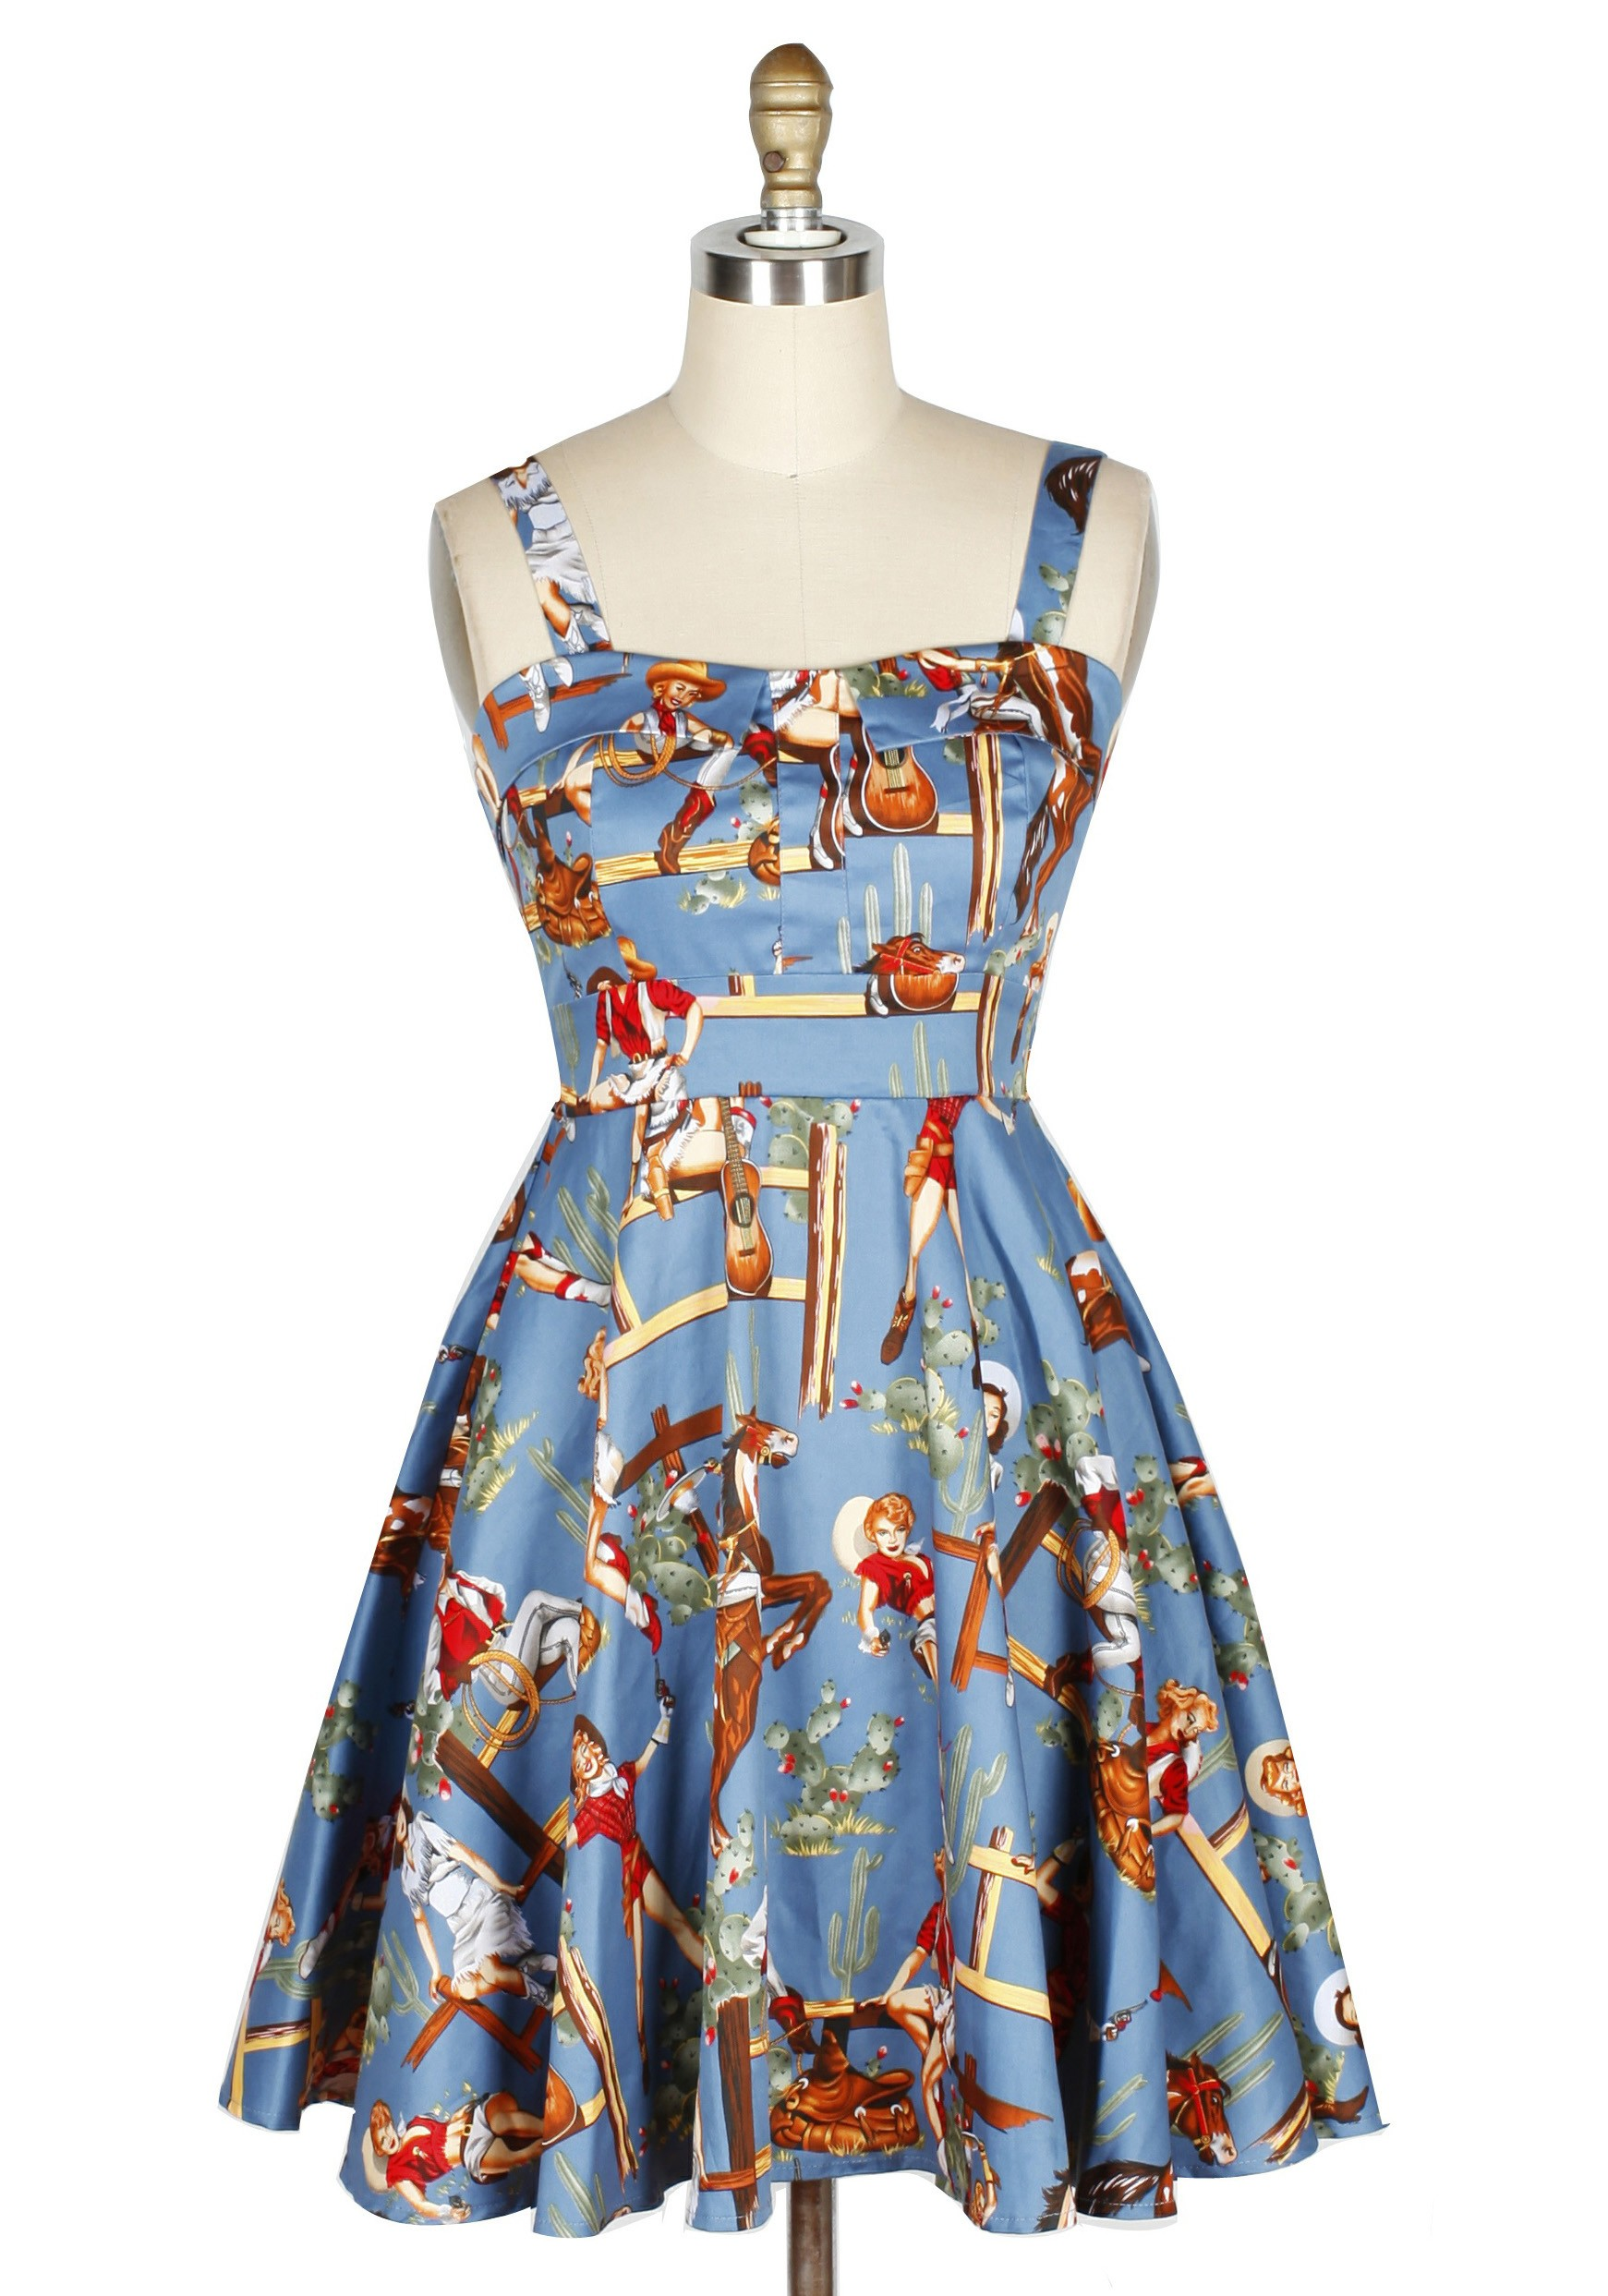 Straight neck line with shoulder strap romper dress